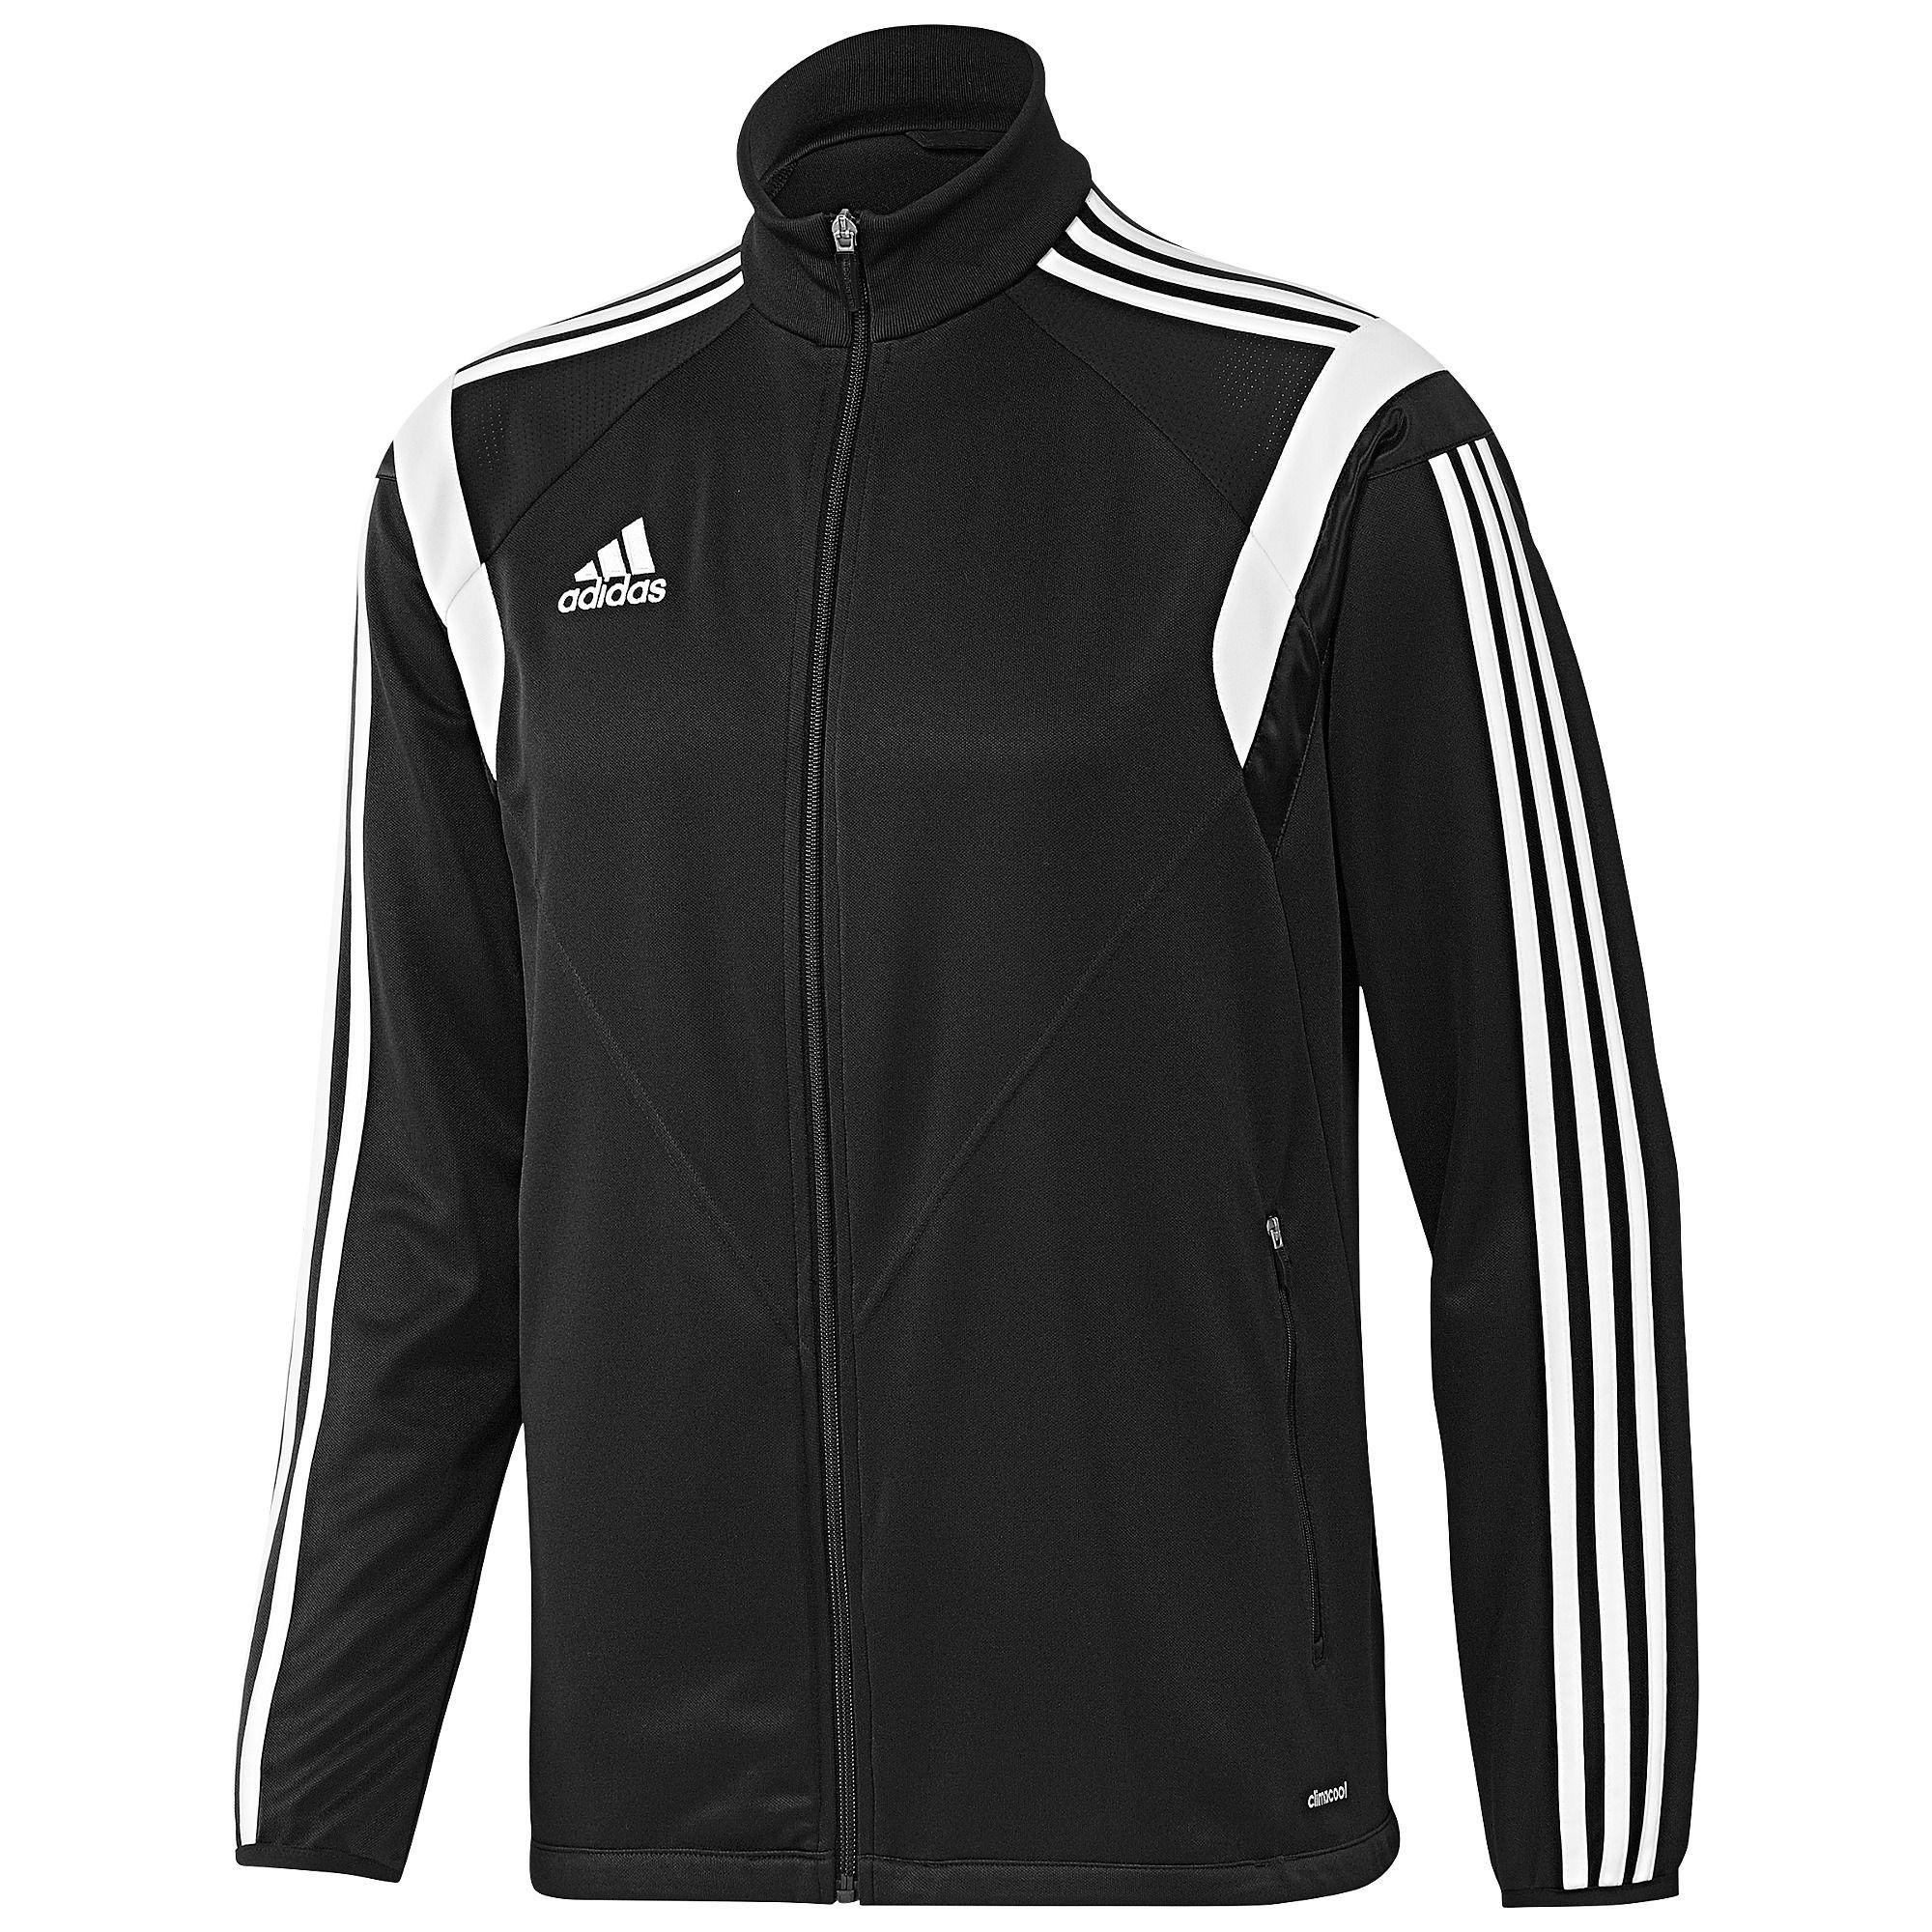 adidas Condivo 14 Training Jacket Men's | $0.00